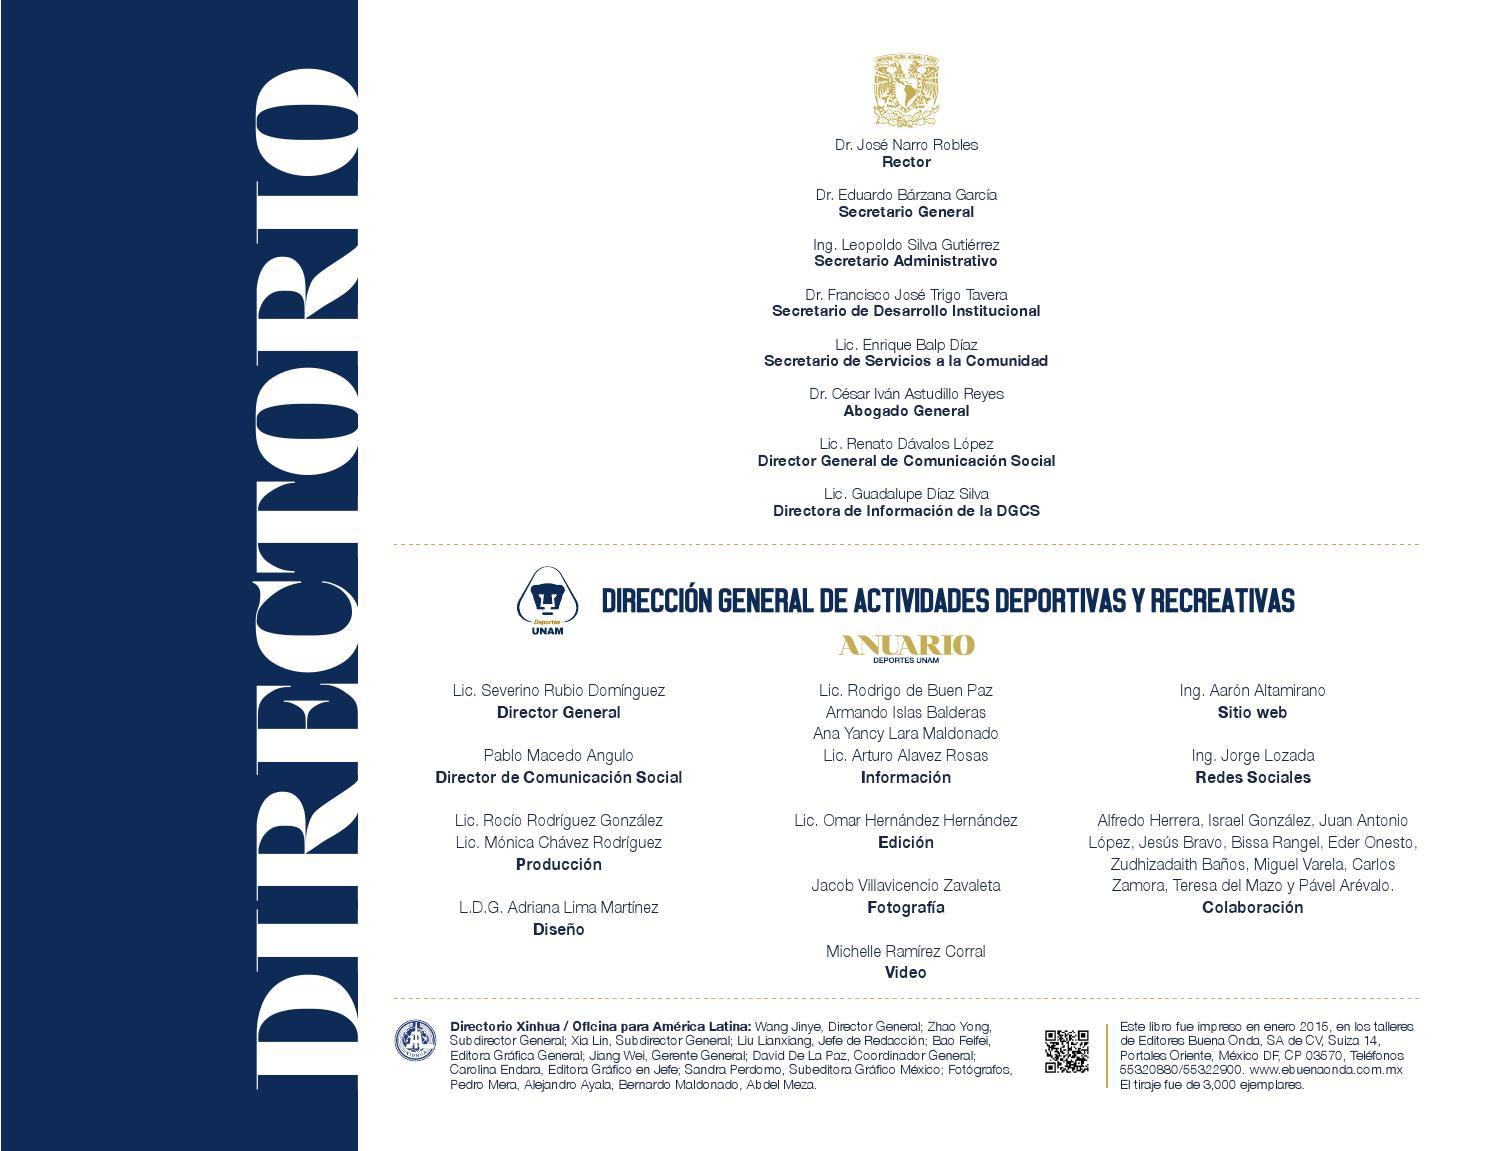 Anuario Deporte 2014 by Adriana Lima - issuu